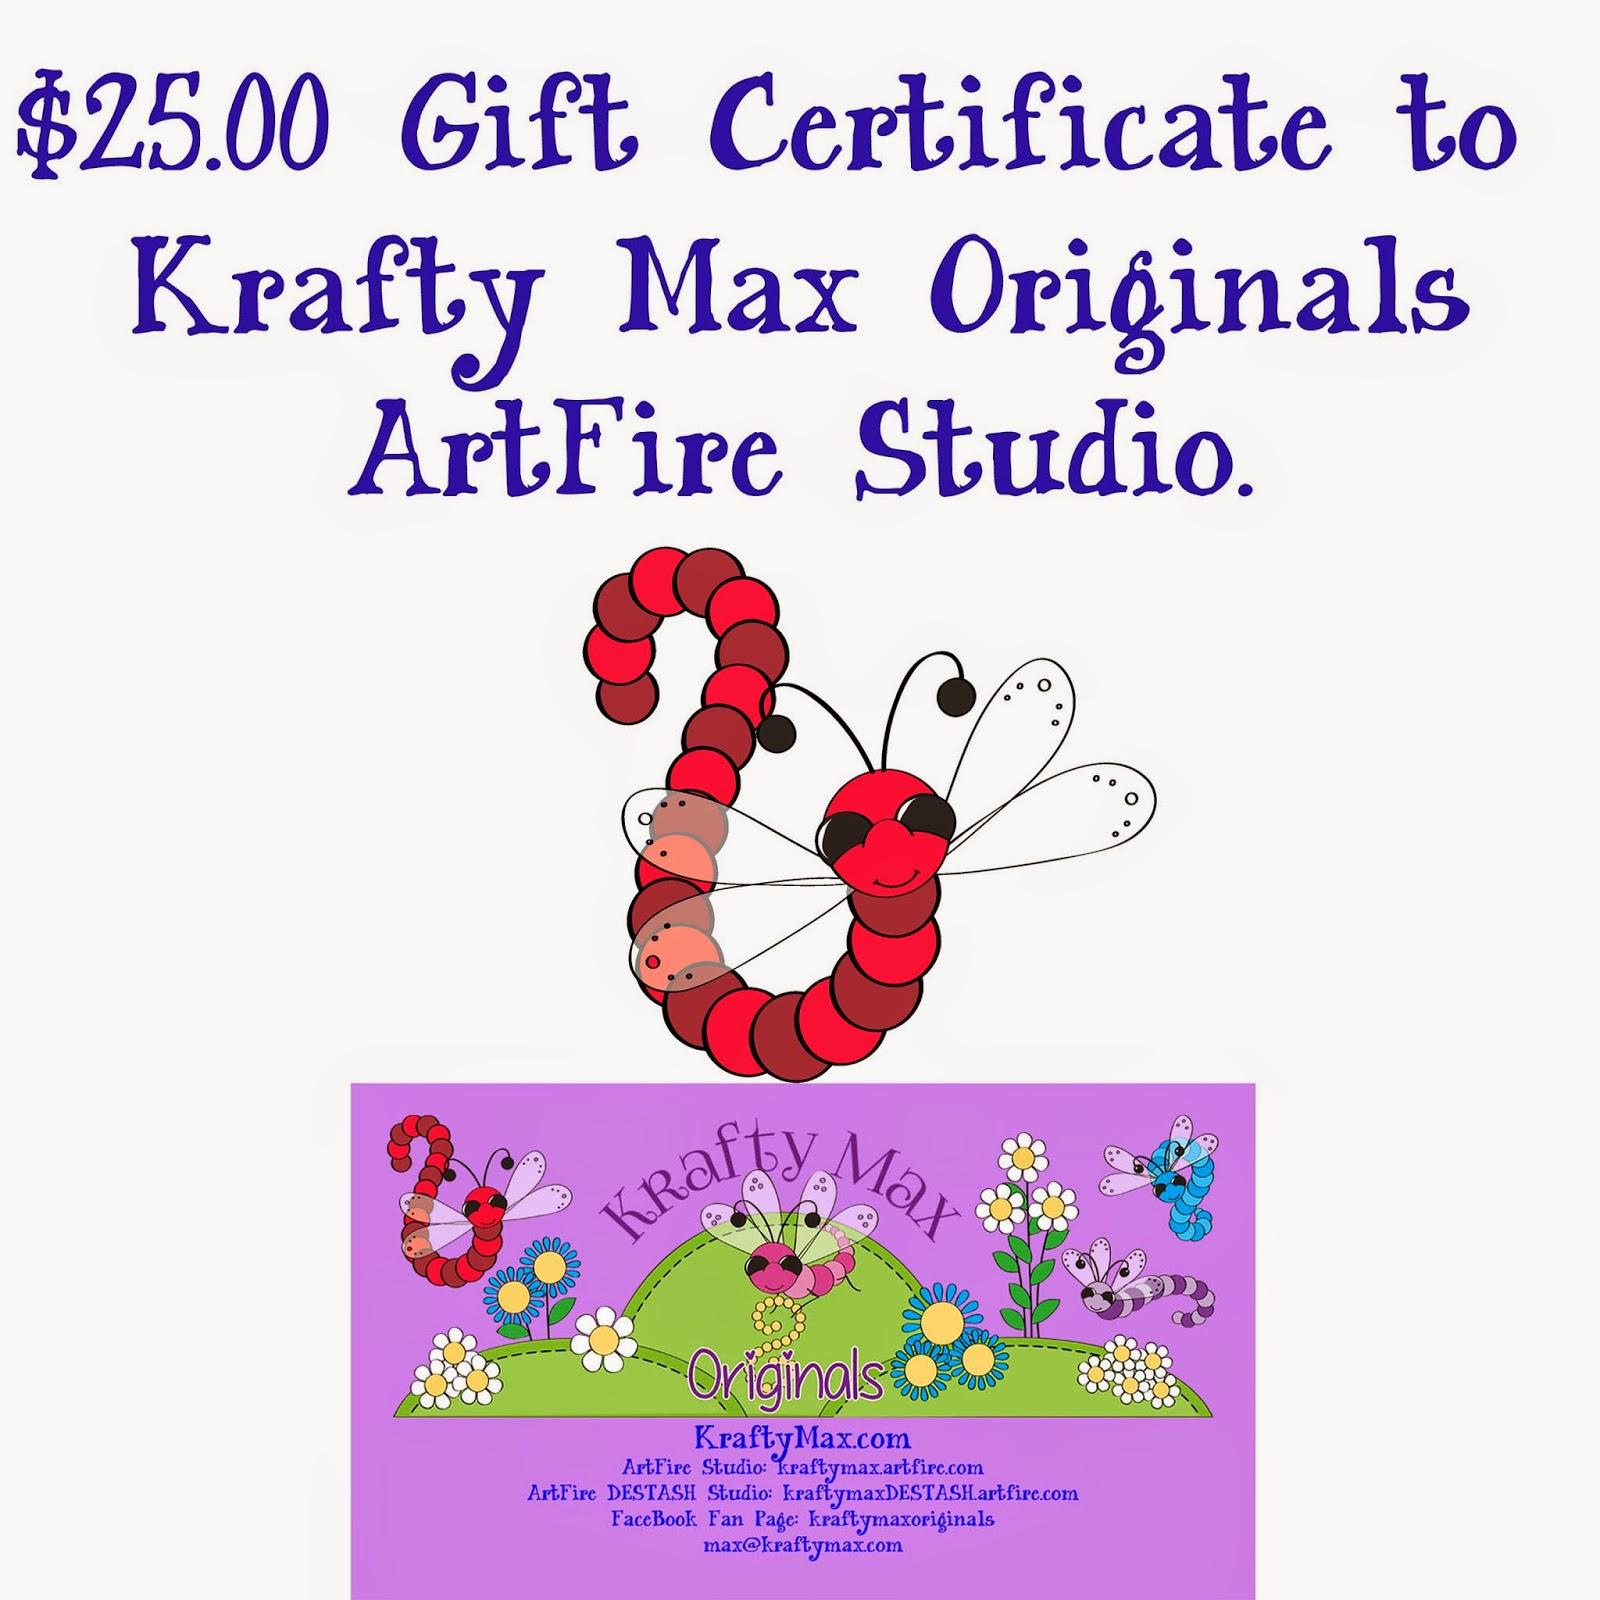 http://www.artfire.com/ext/shop/studio/KraftyMax/0/0/49248